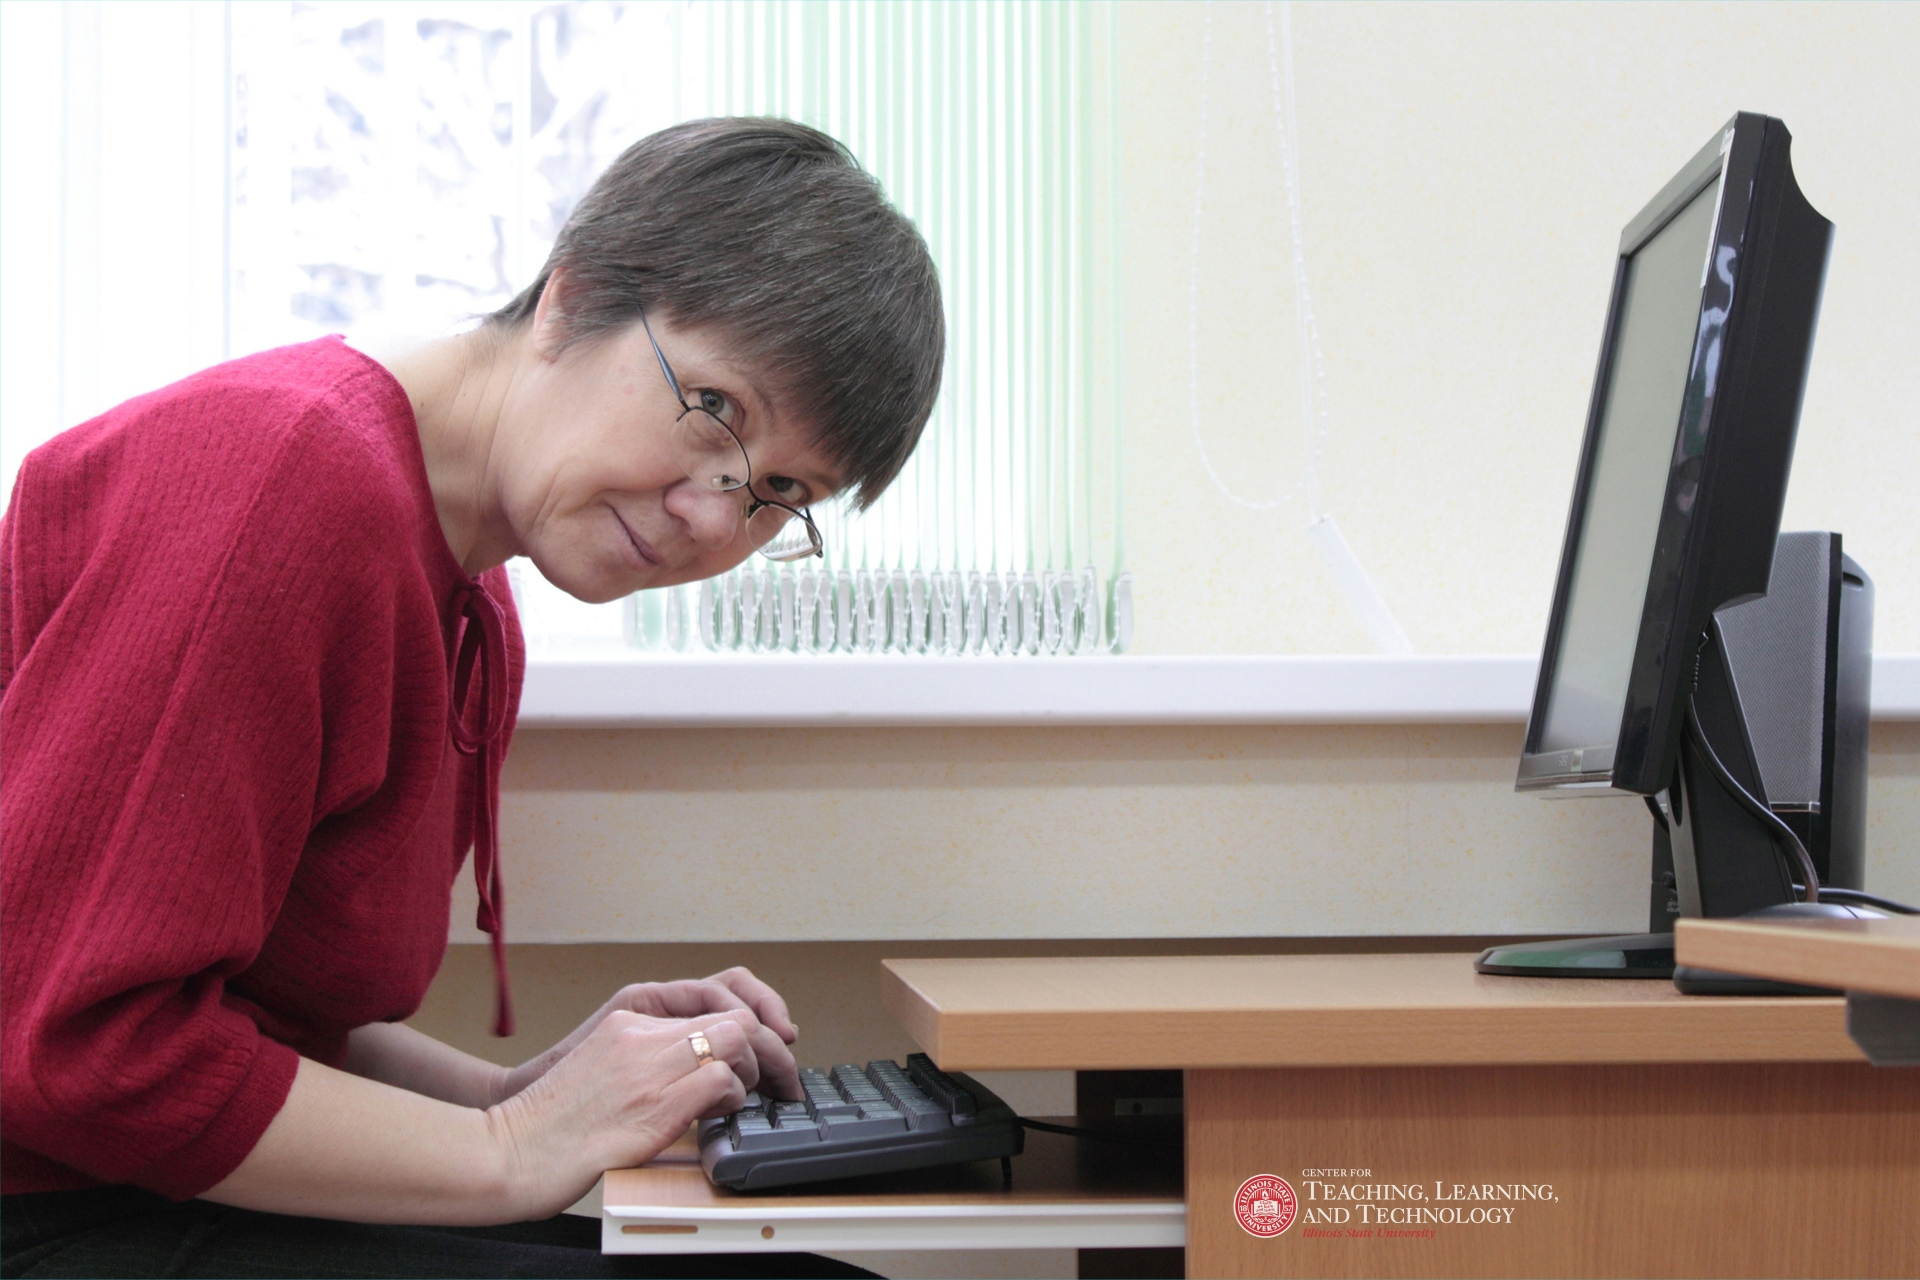 professor looking into camera, sitting at desk